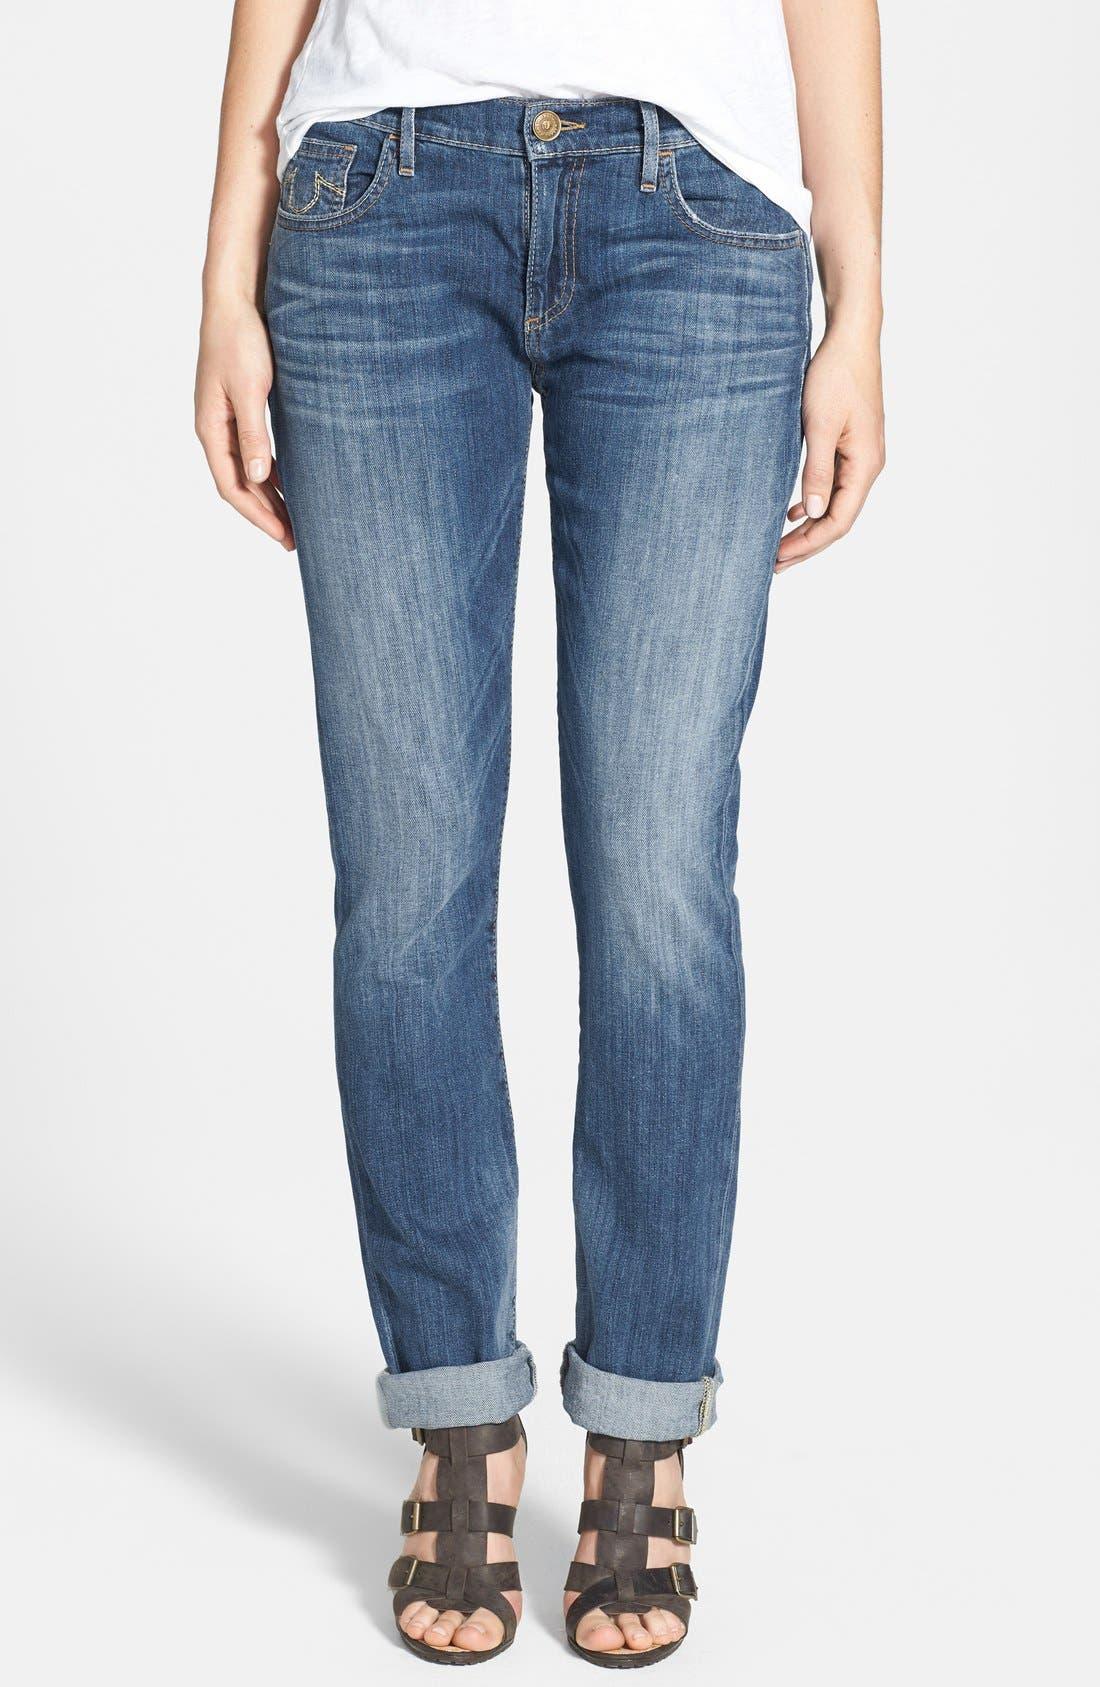 Main Image - True Religion Brand Jeans 'Audrey' Boyfriend Jeans (Spring Ink)